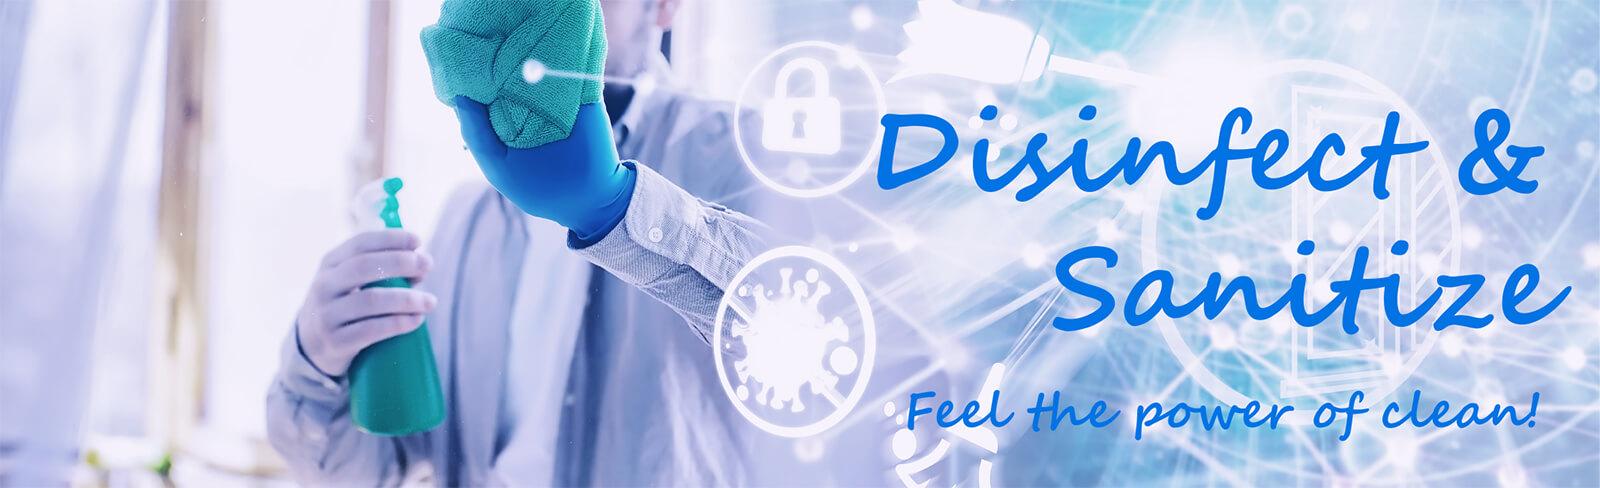 disinfectant-sanitizers-banner.jpg